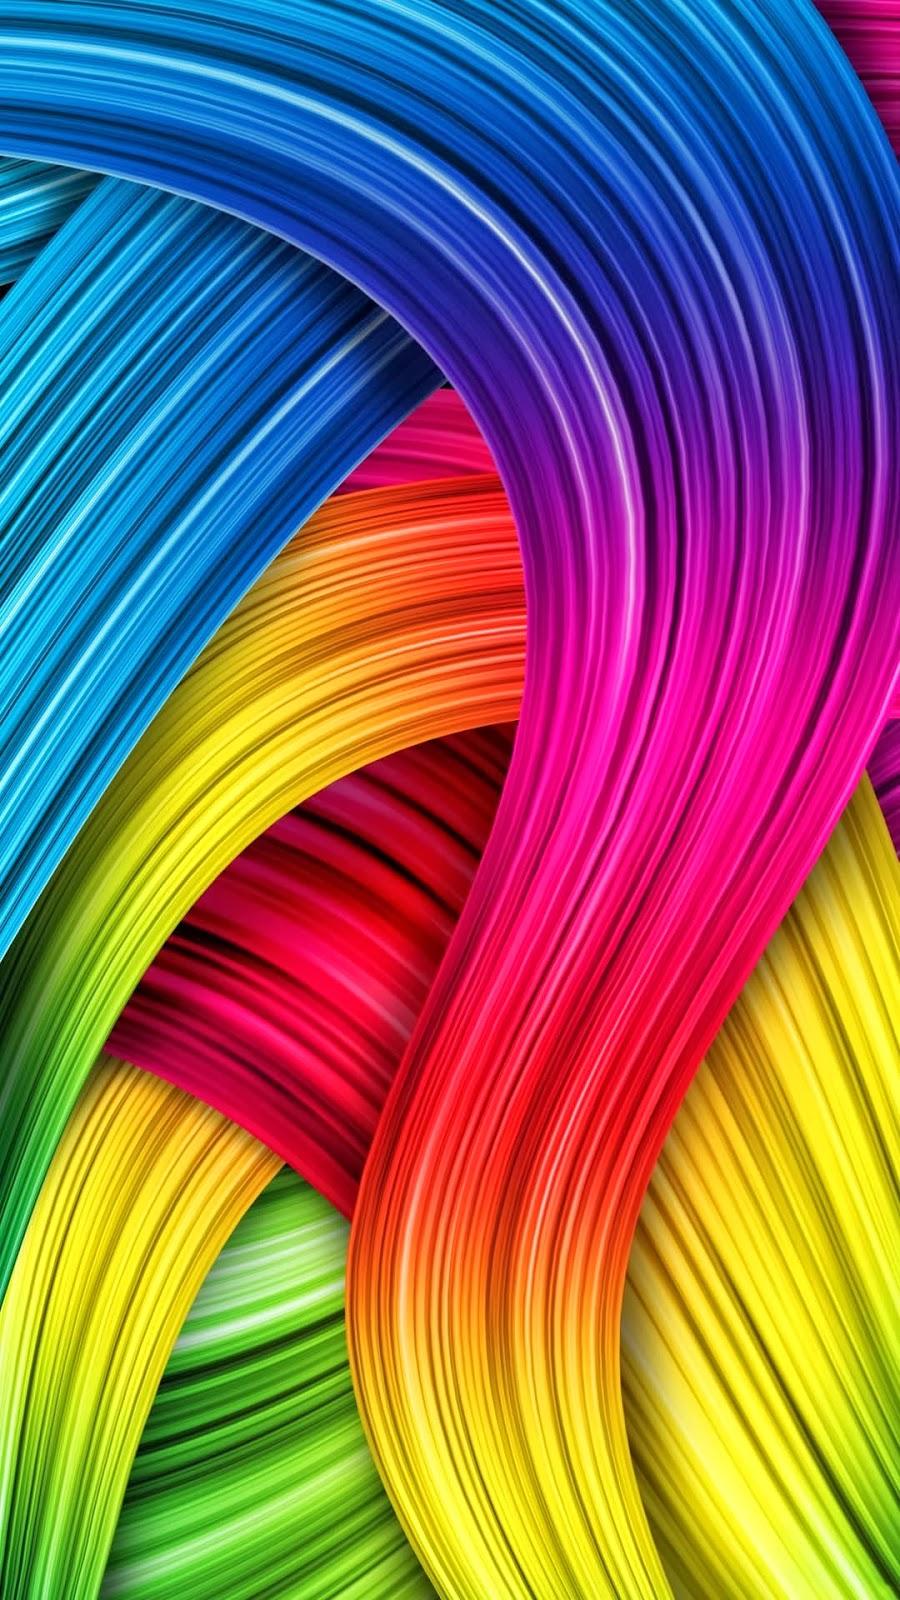 Samsung Galaxy S3 Wallpapers | Wallpaper Albums